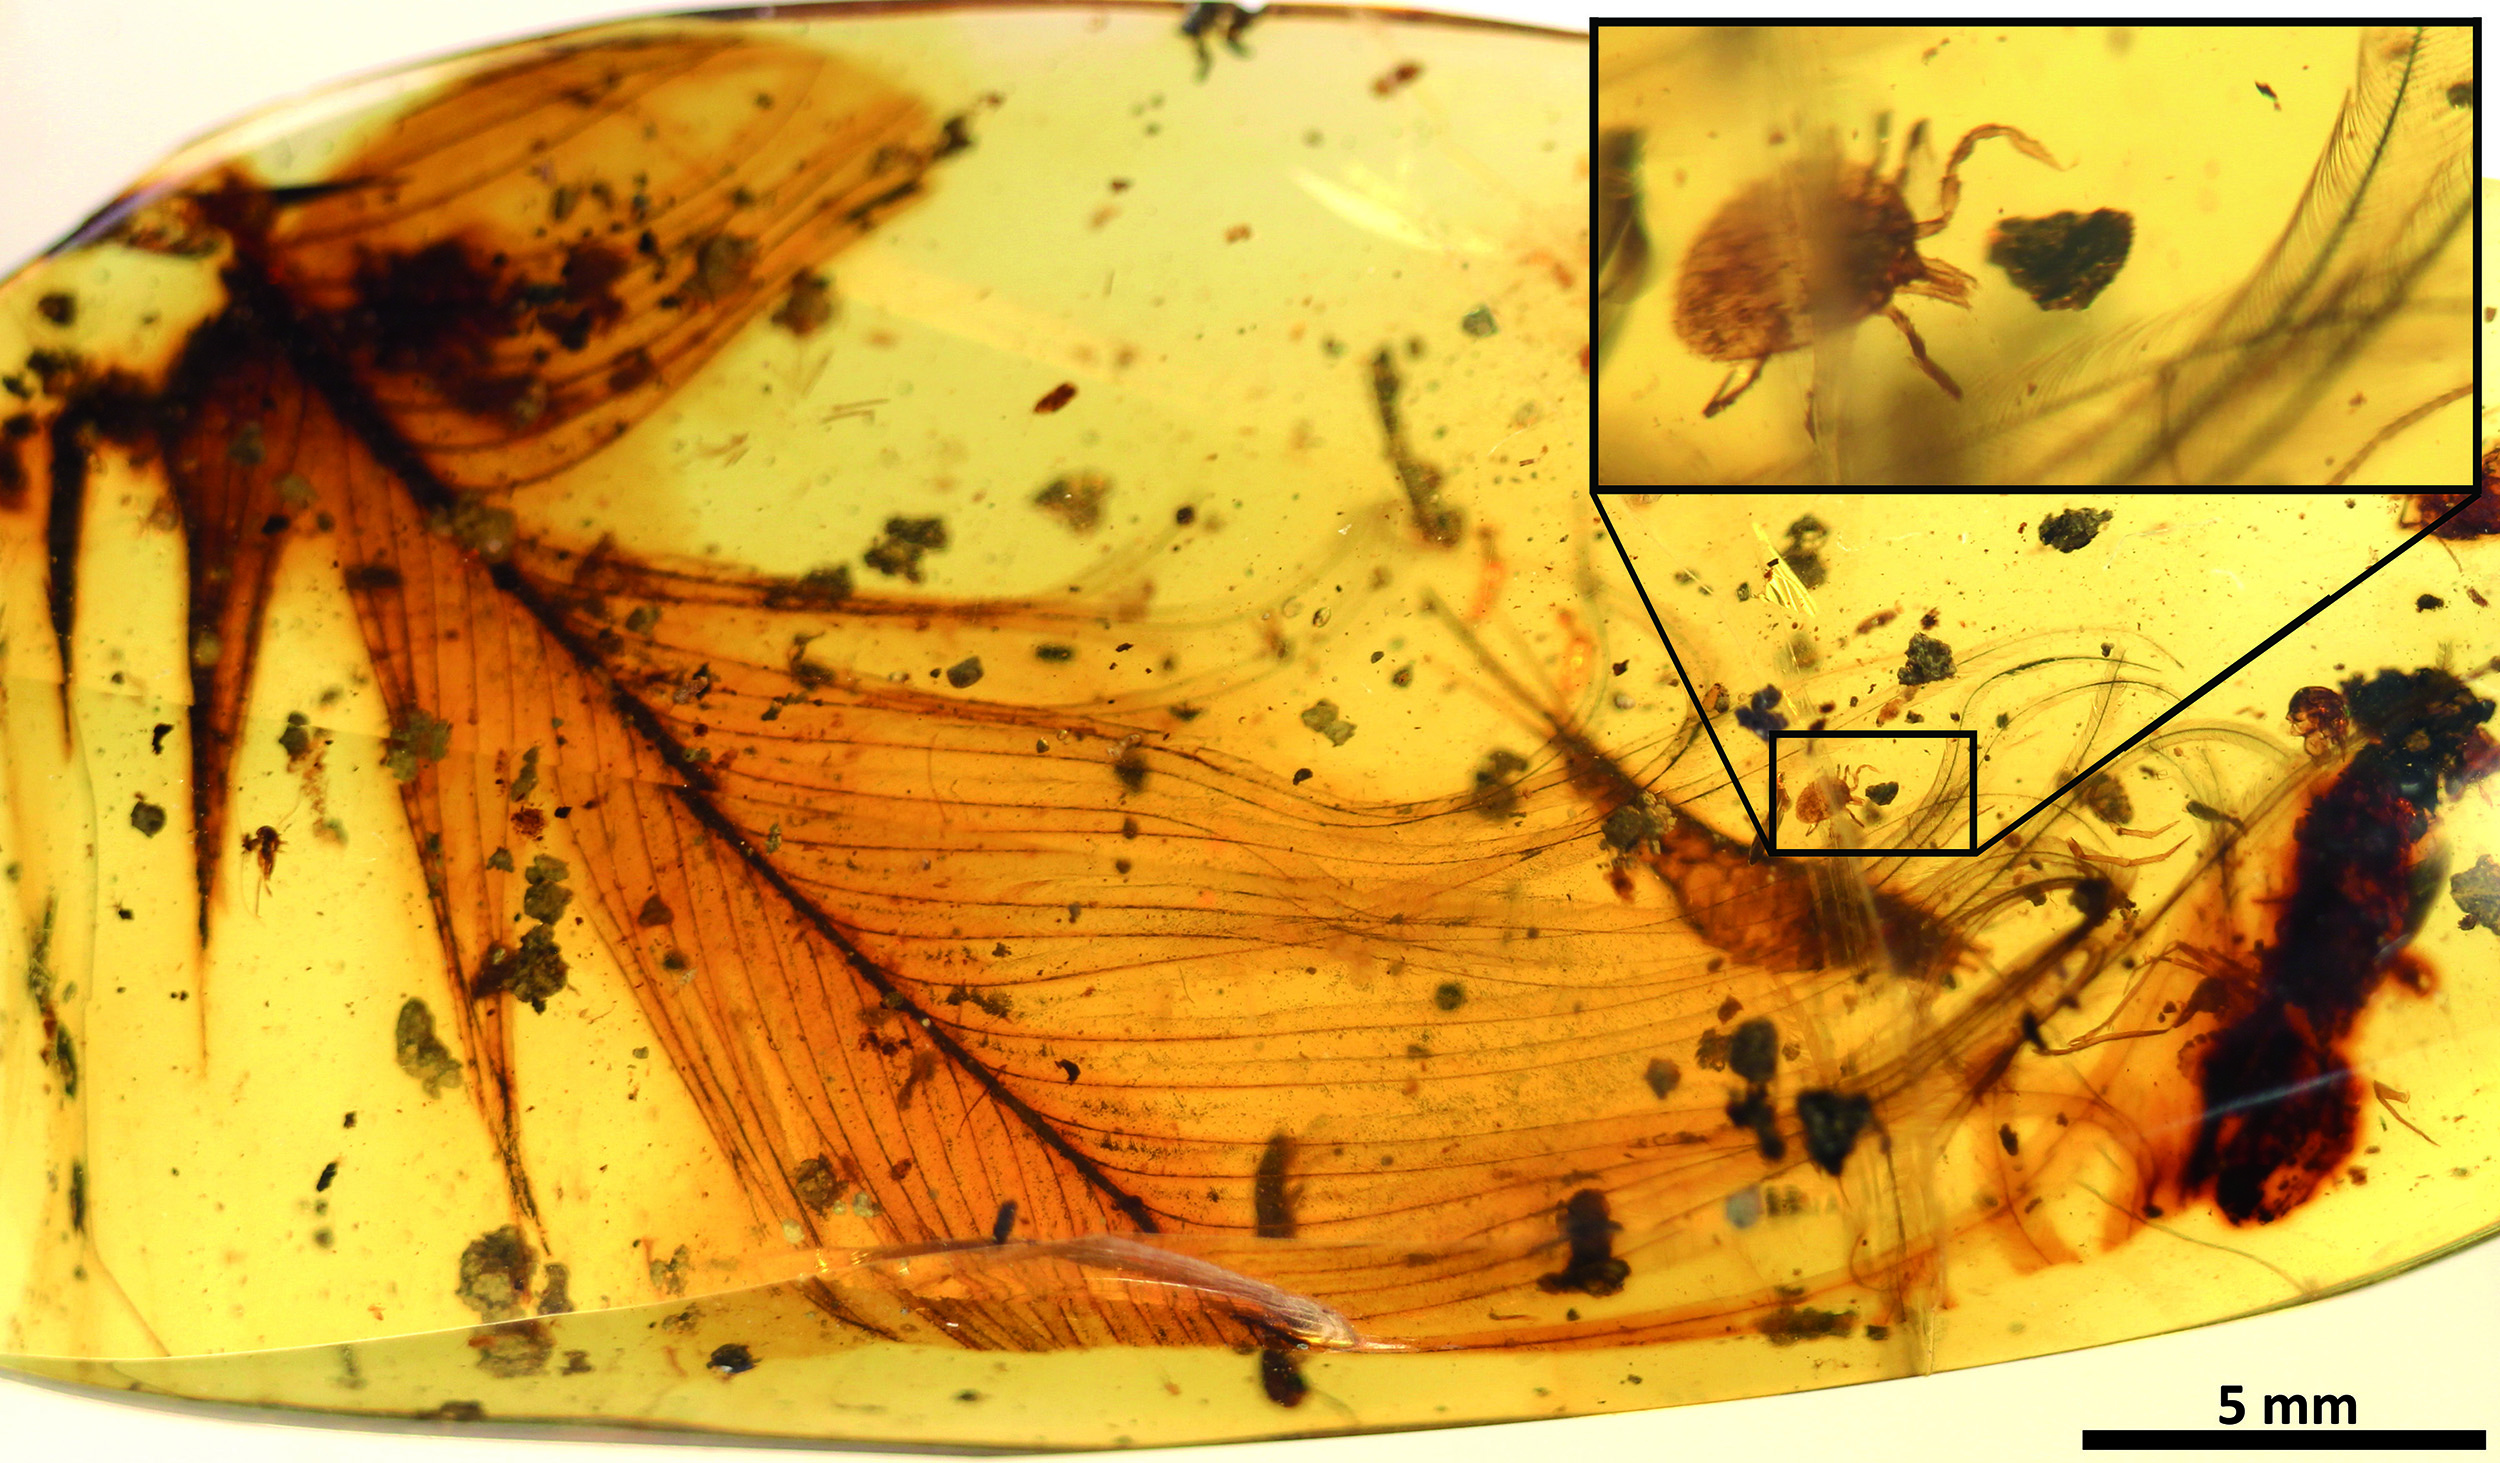 Ticks fed on dinosaurs, amber evidence shows